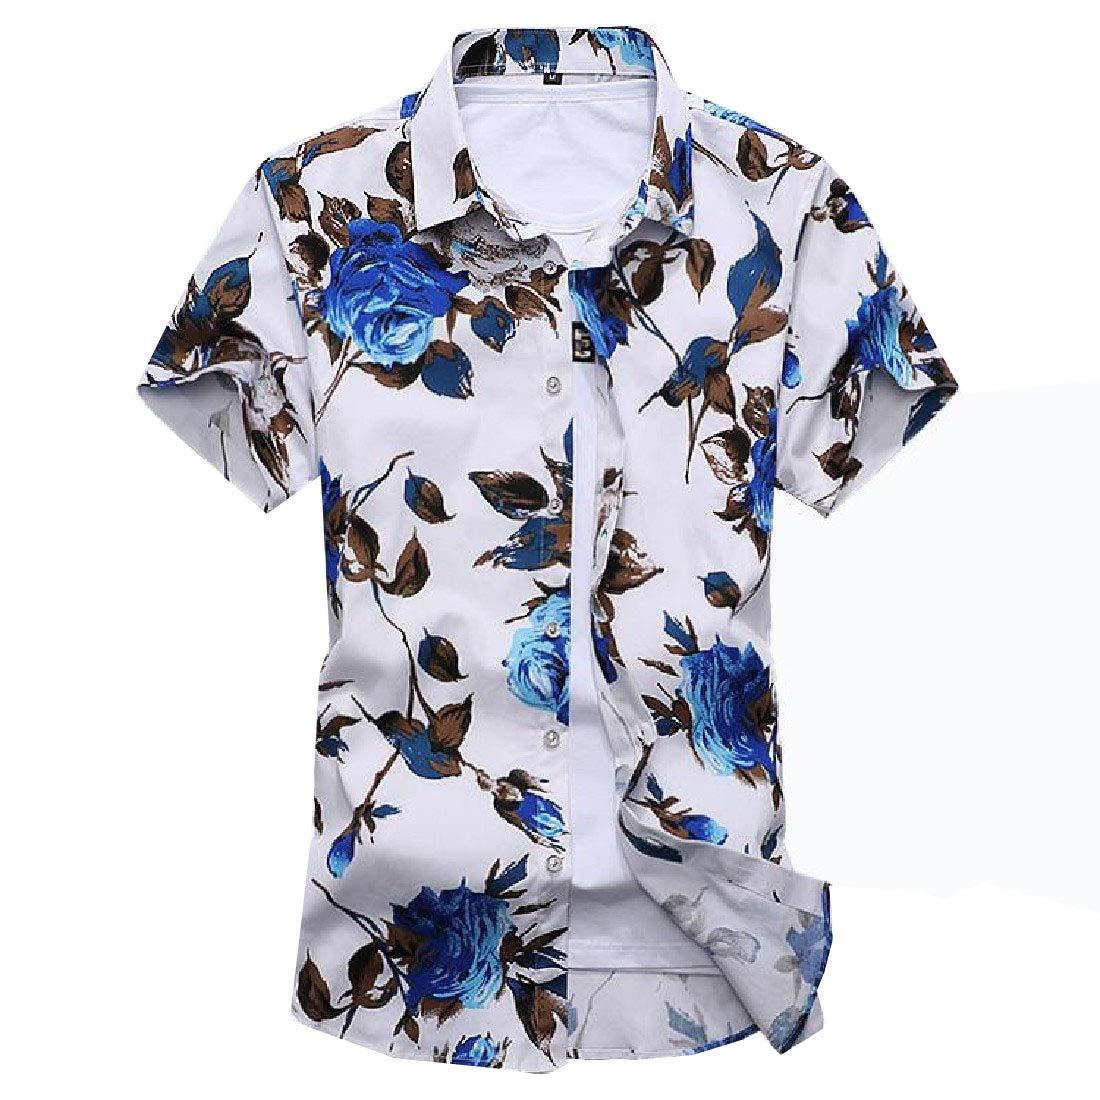 Andopa Mens Short Sleeve Button Cotton Turn-Down Collar Plus Size Shirt